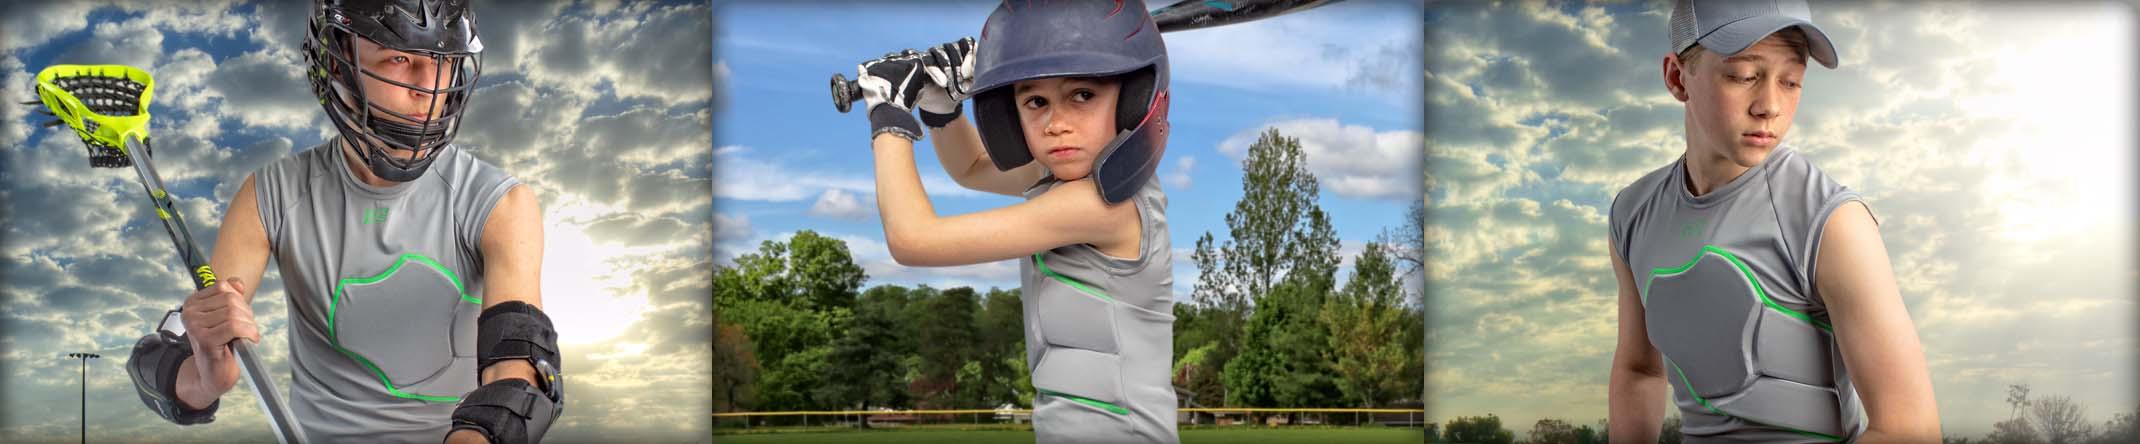 pro-athlete-protection-hart-shirt-wear